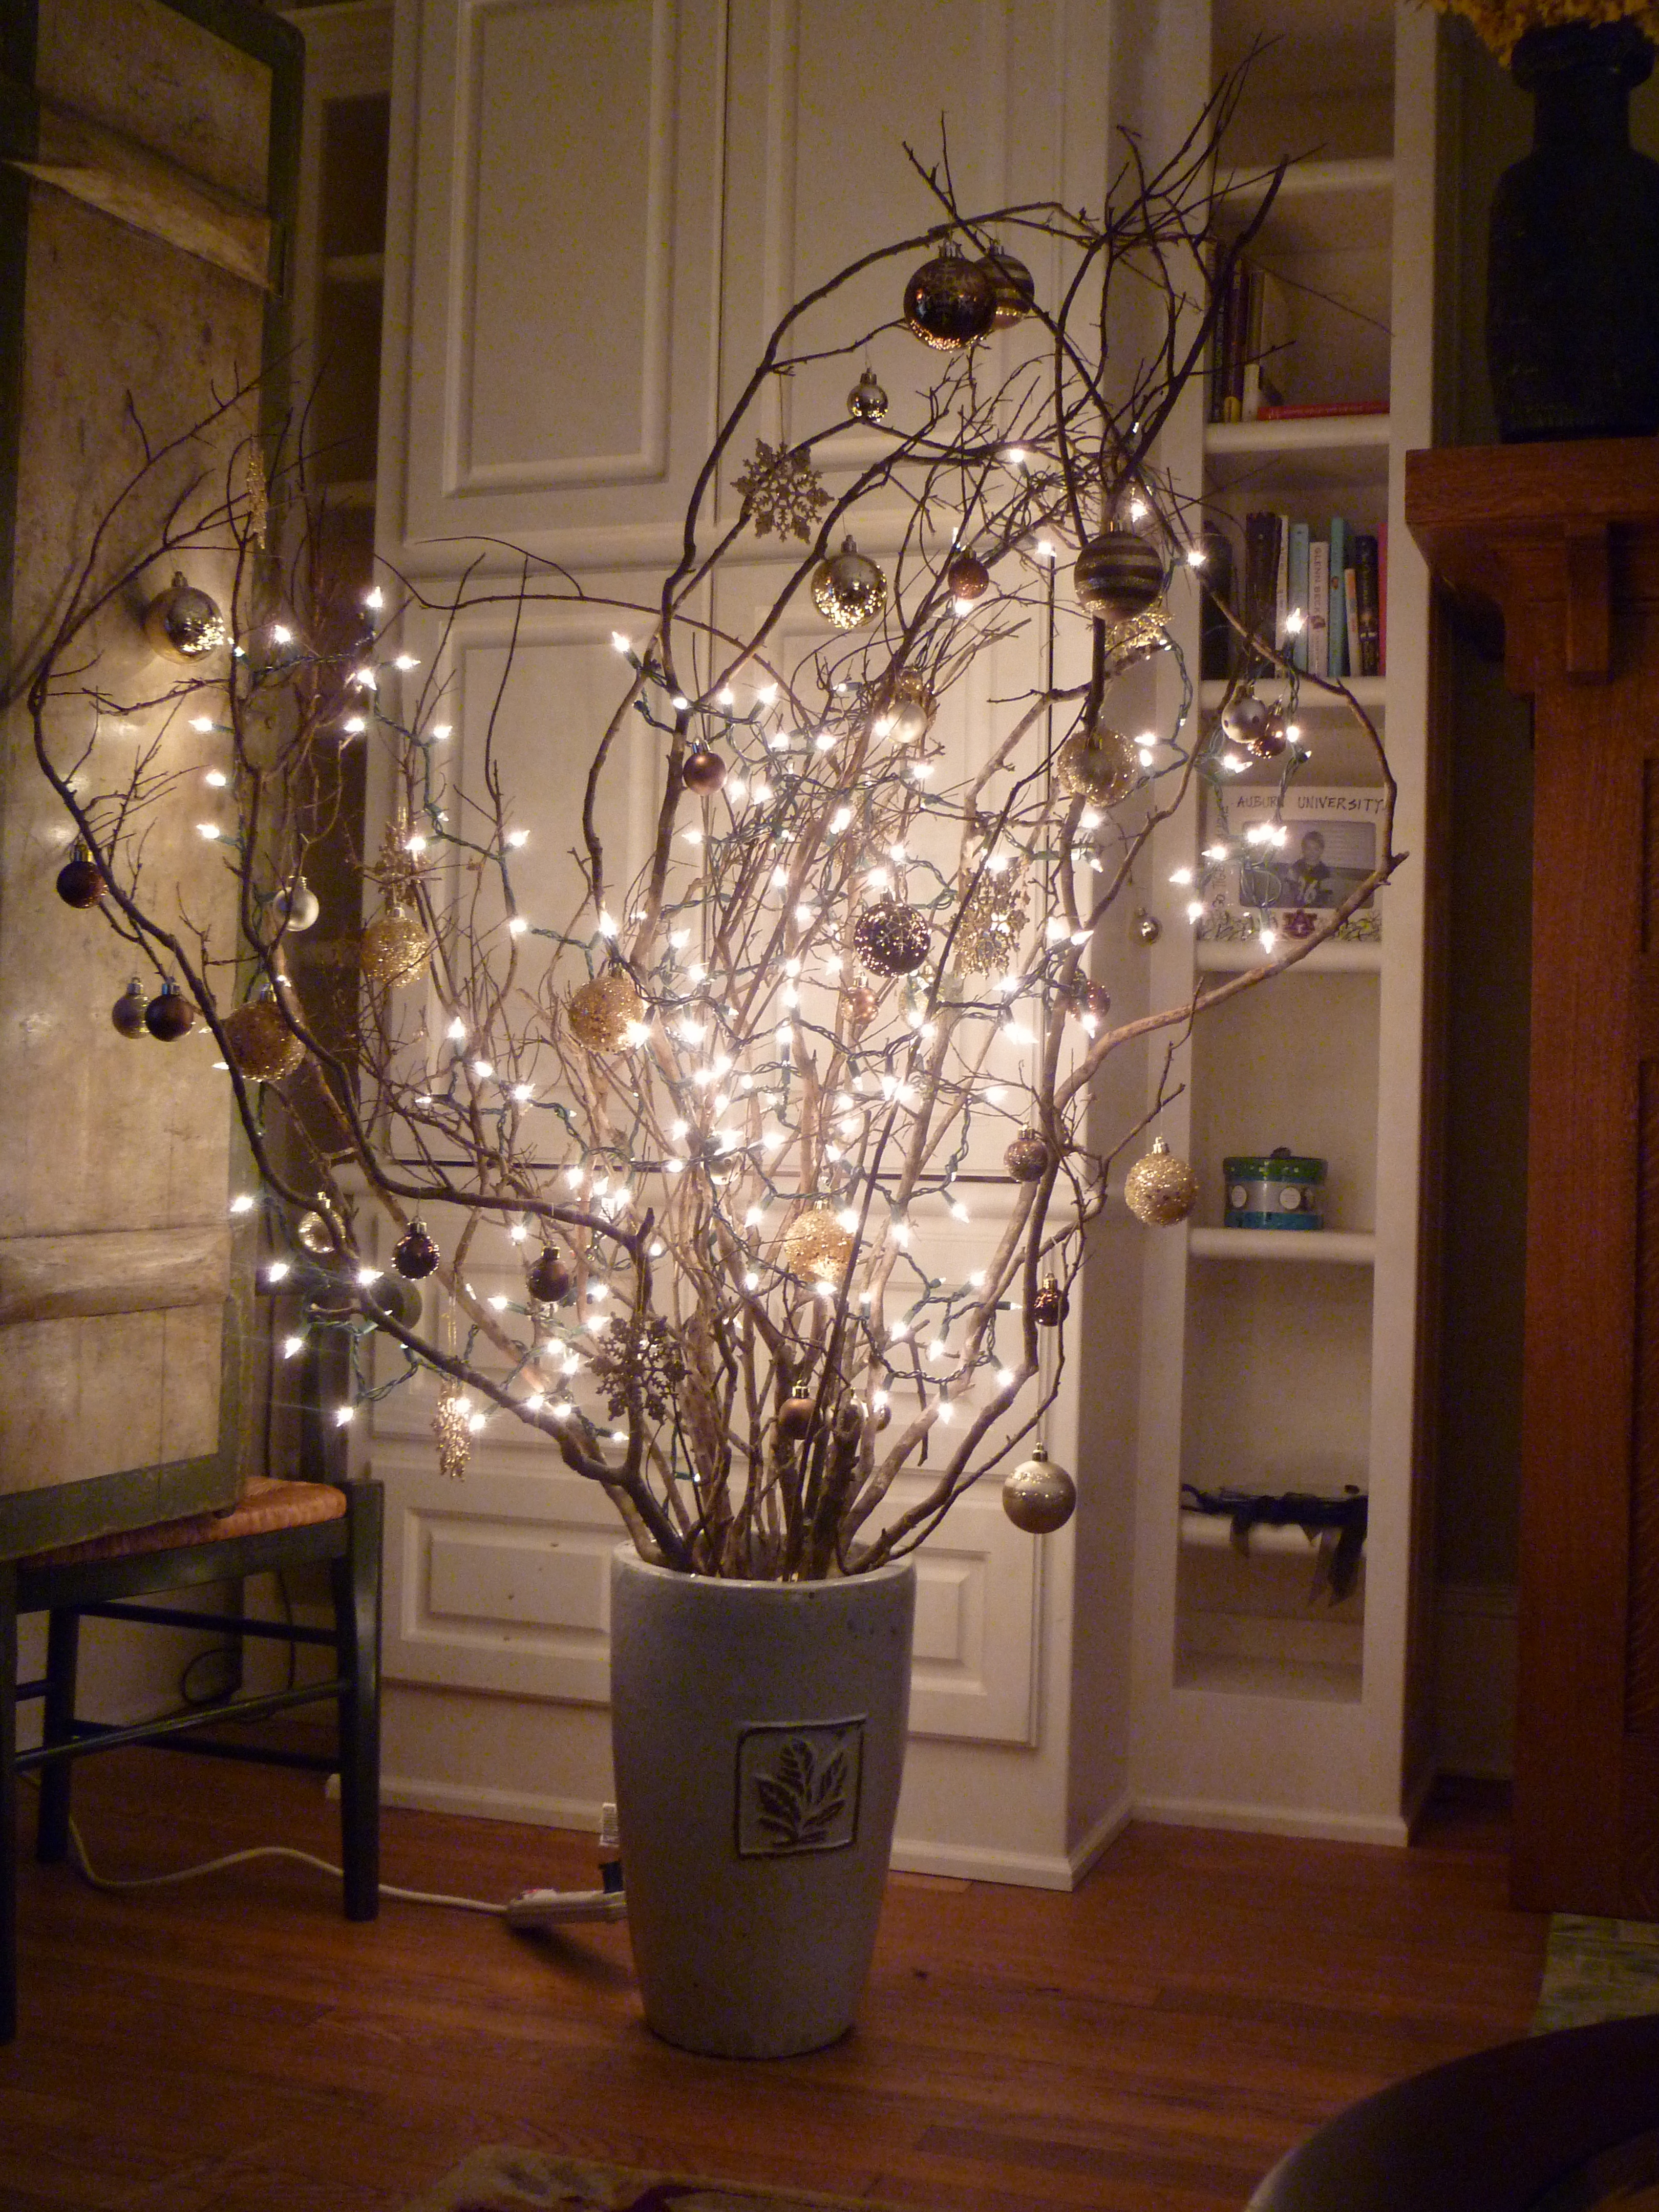 Classy outdoor christmas decorations ideas - Alternative Christmas Tree